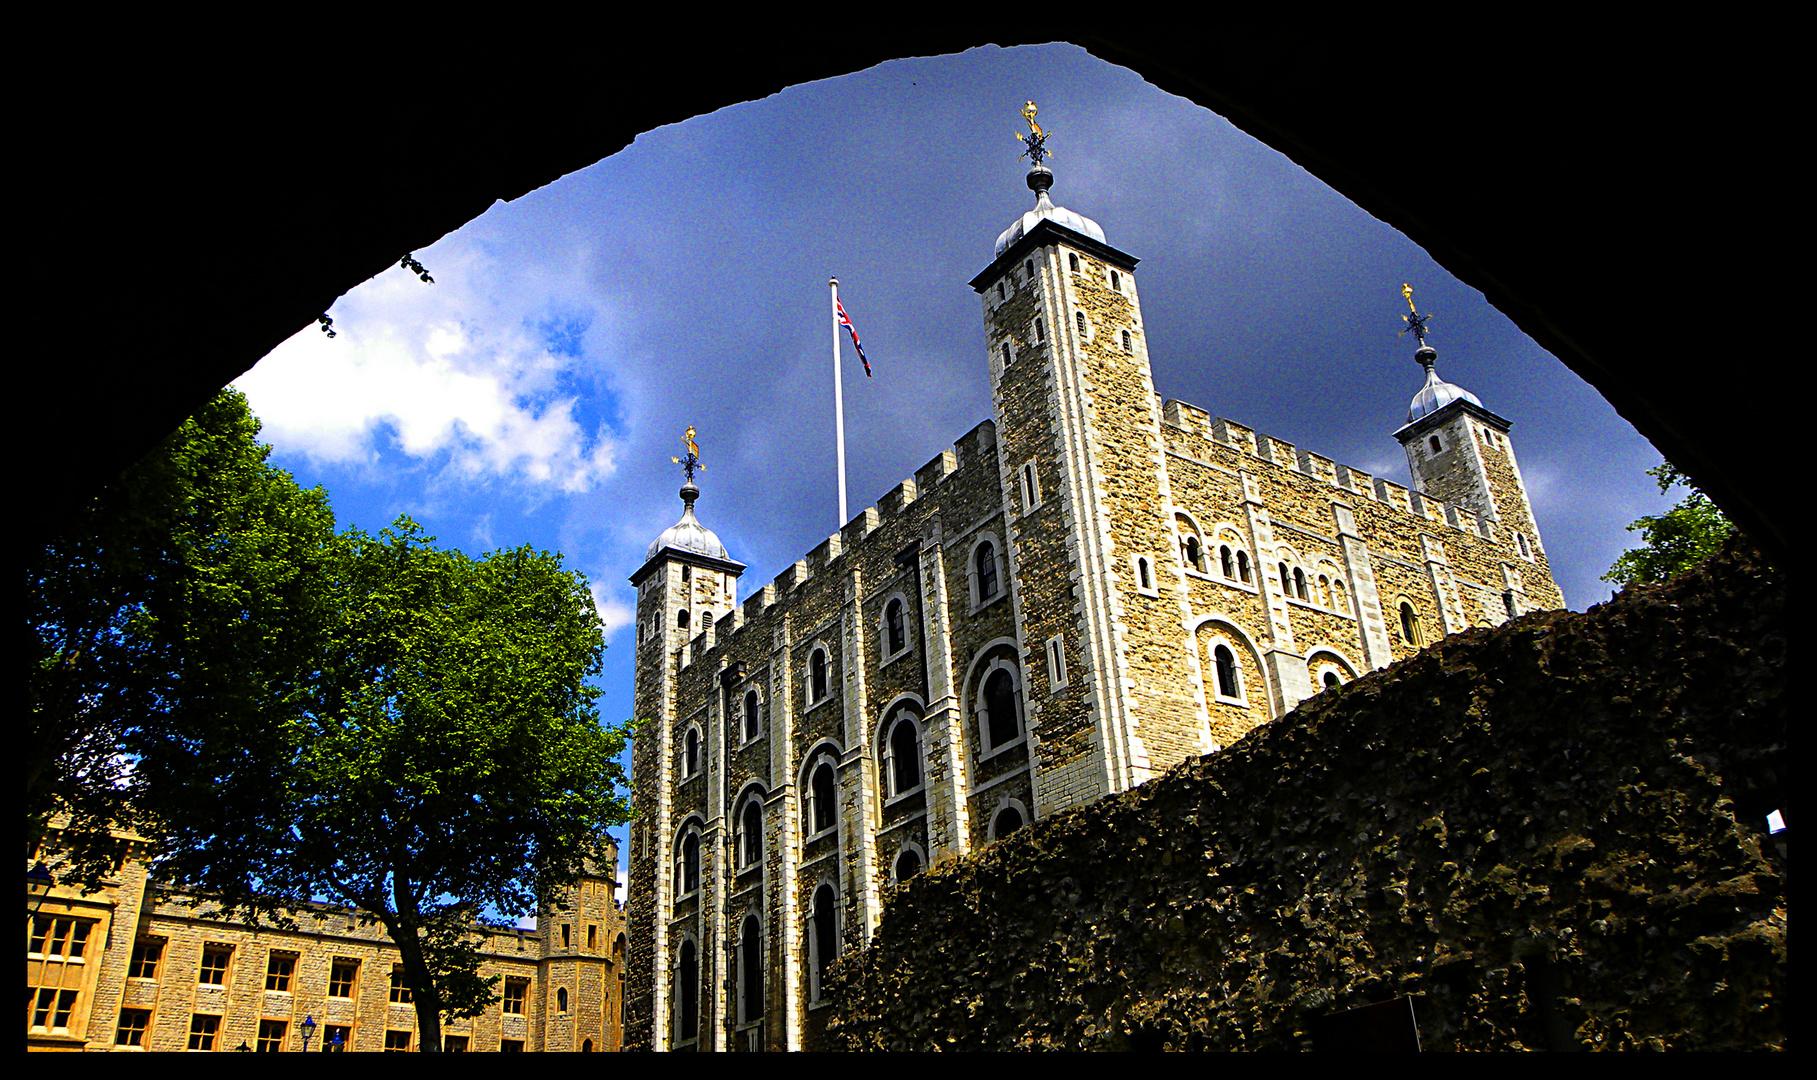 Tower of London - Einblicke